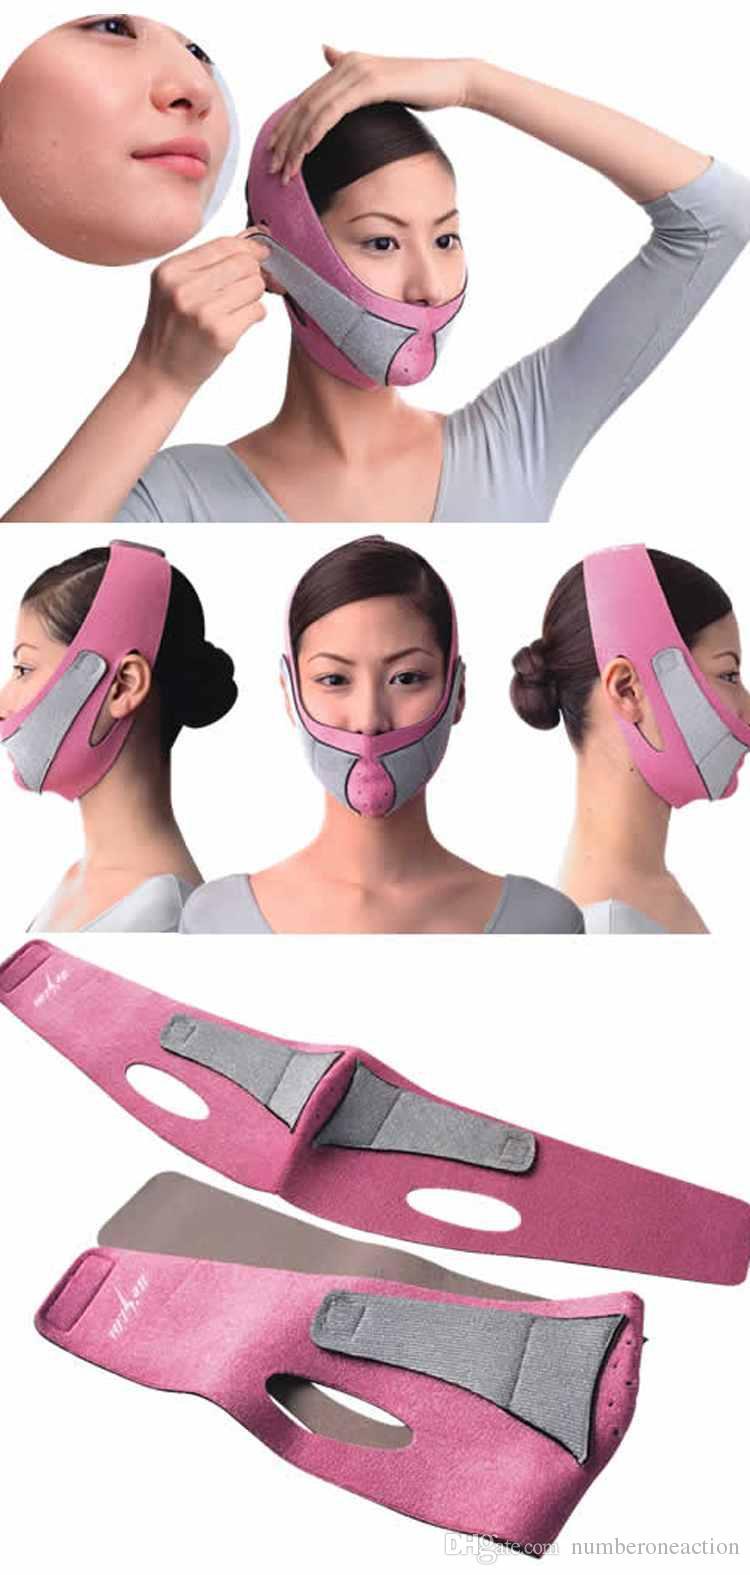 Face Lift Up Belt Sleeping Face Lift Mask Massage Gesichtspflege Entspannung, Gesichtsmaske Face Lift Bandage